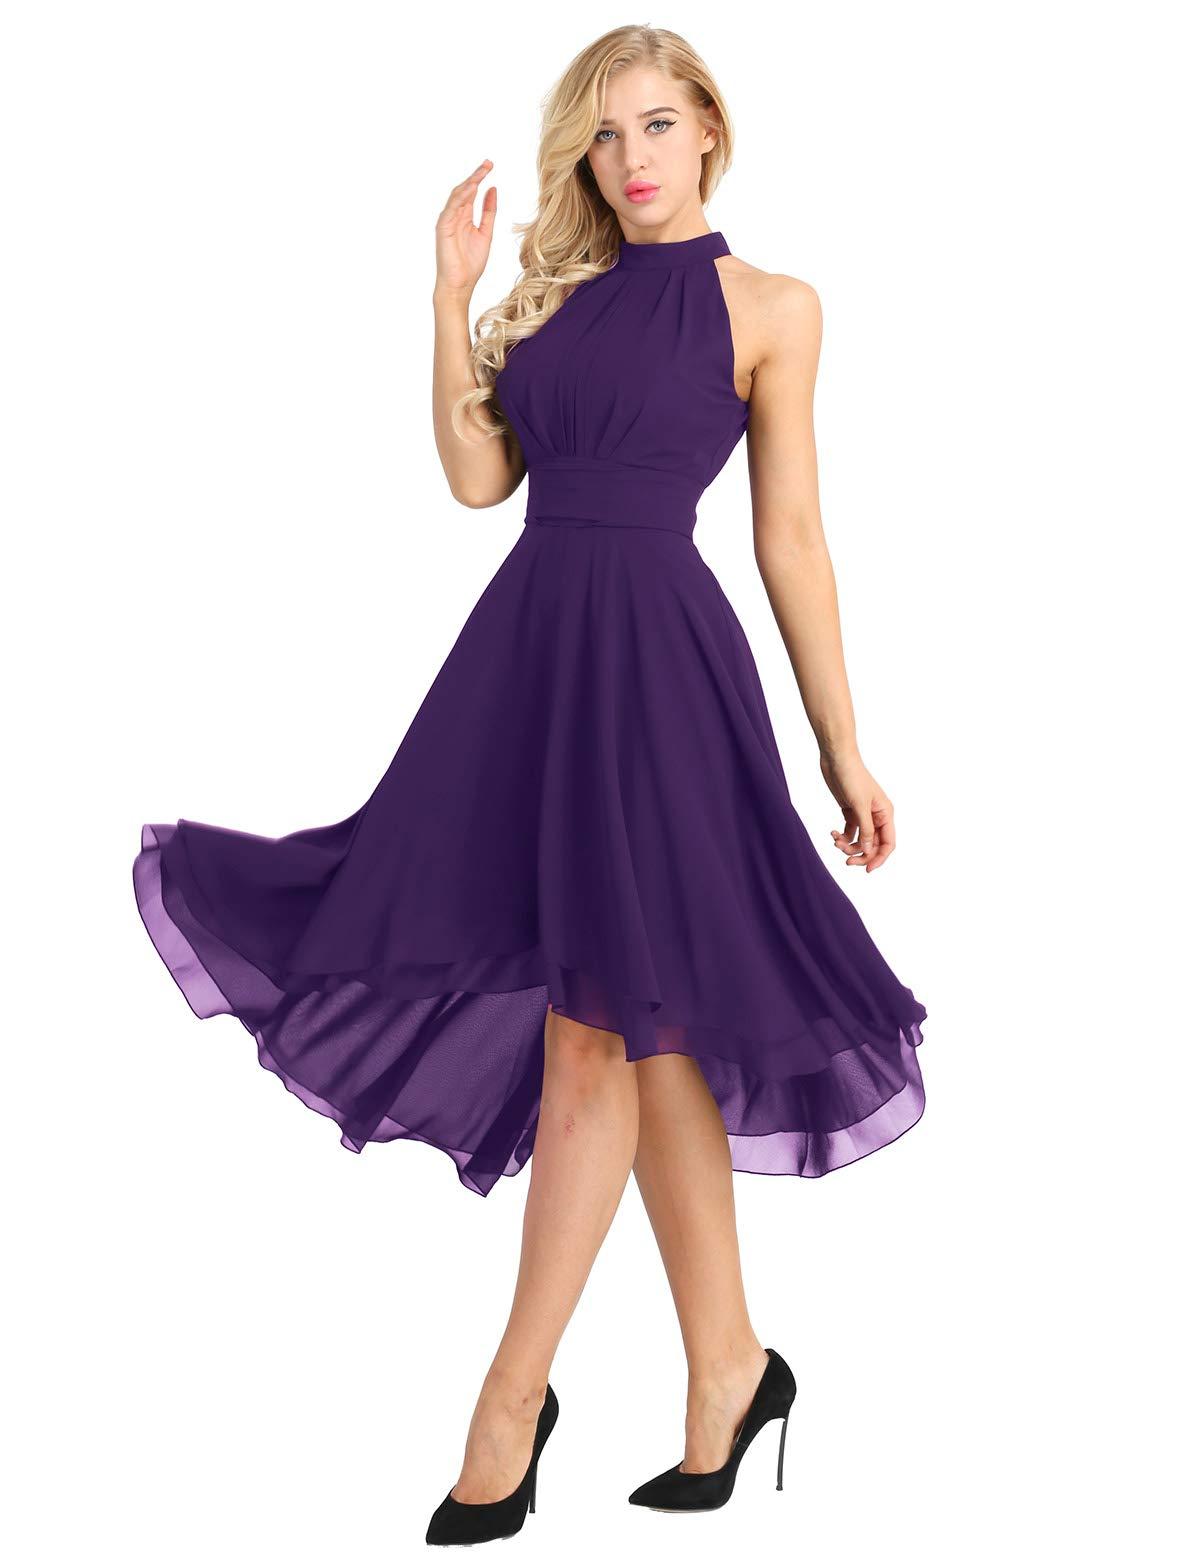 purple dress wedding guest